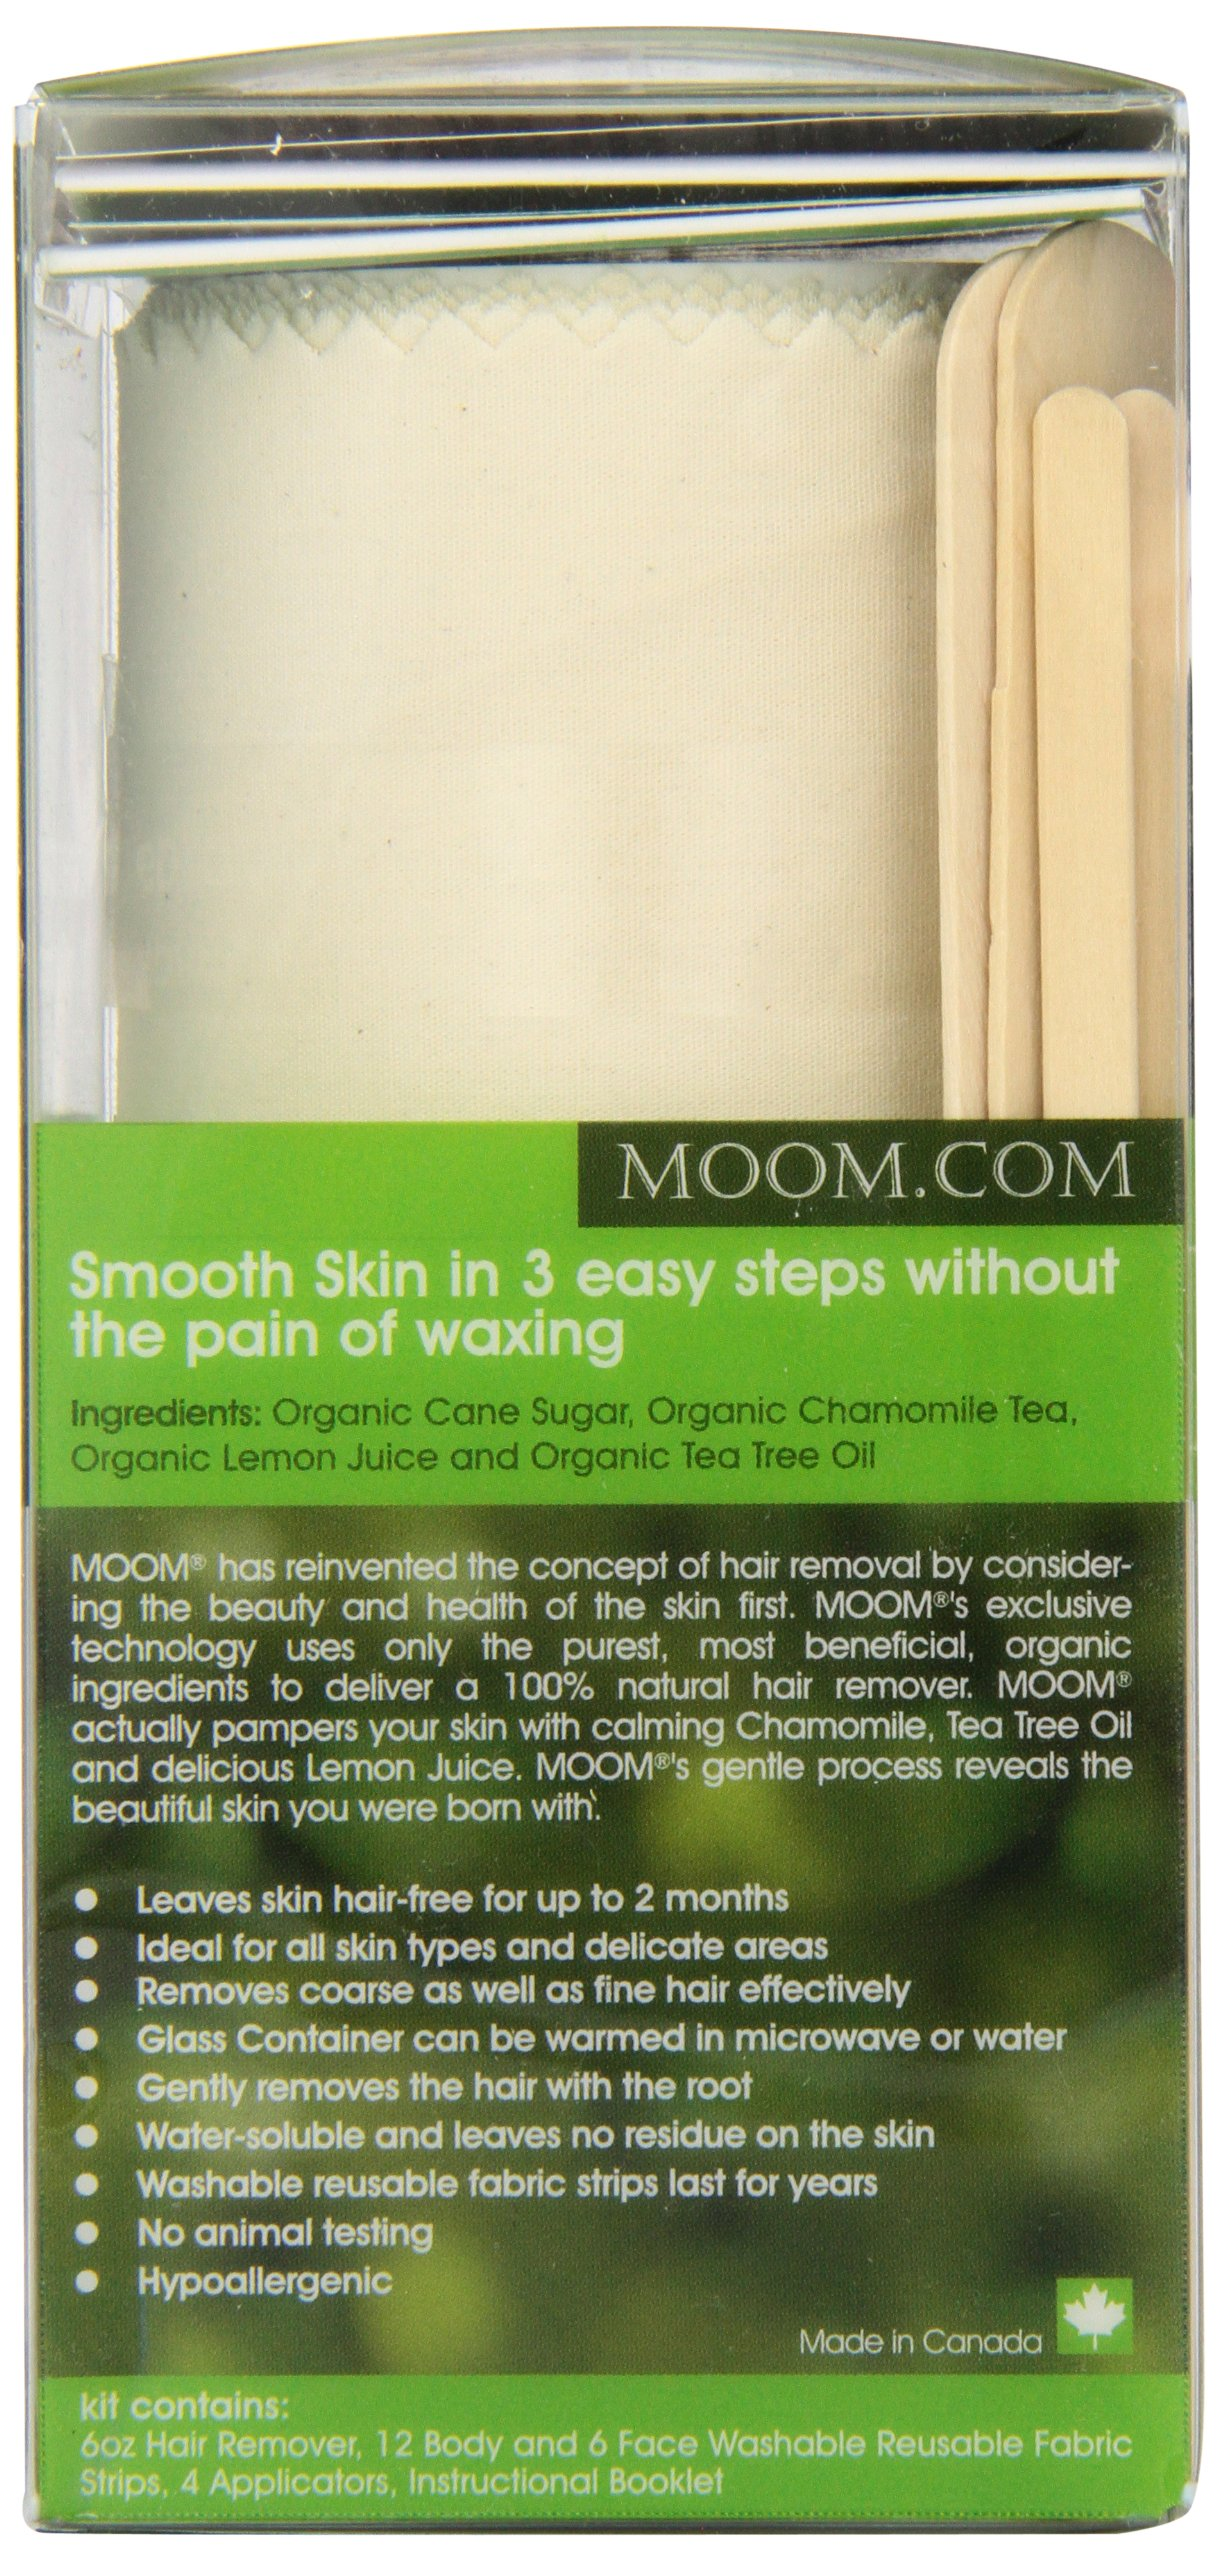 Moom Organic Hair Removal Kit, Tea Tree, 6-Ounce Package by Moom (Image #5)